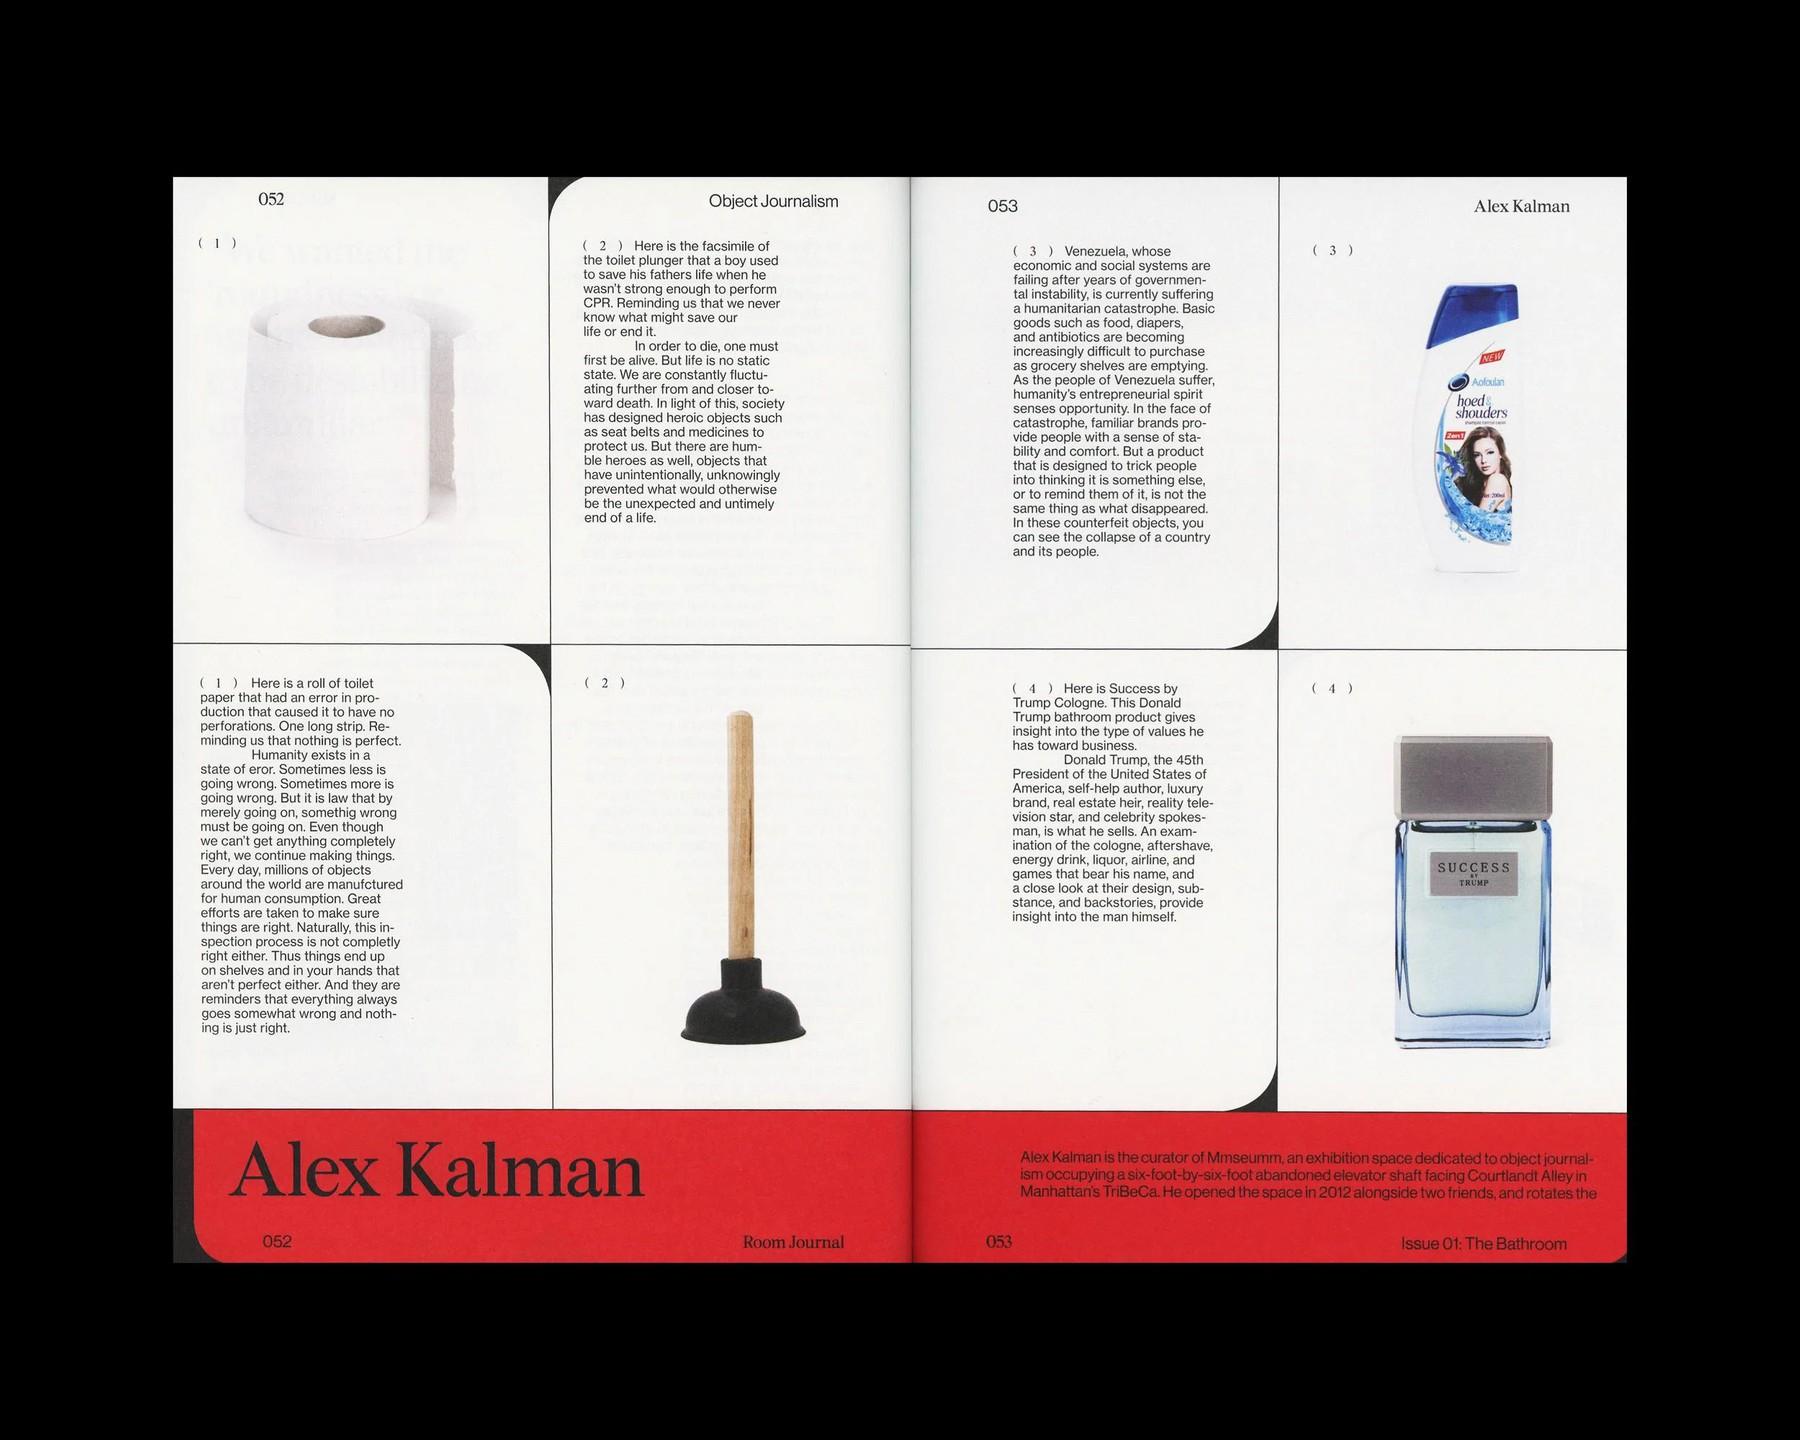 room-journal-work-publication-itsincethat-7.jpg